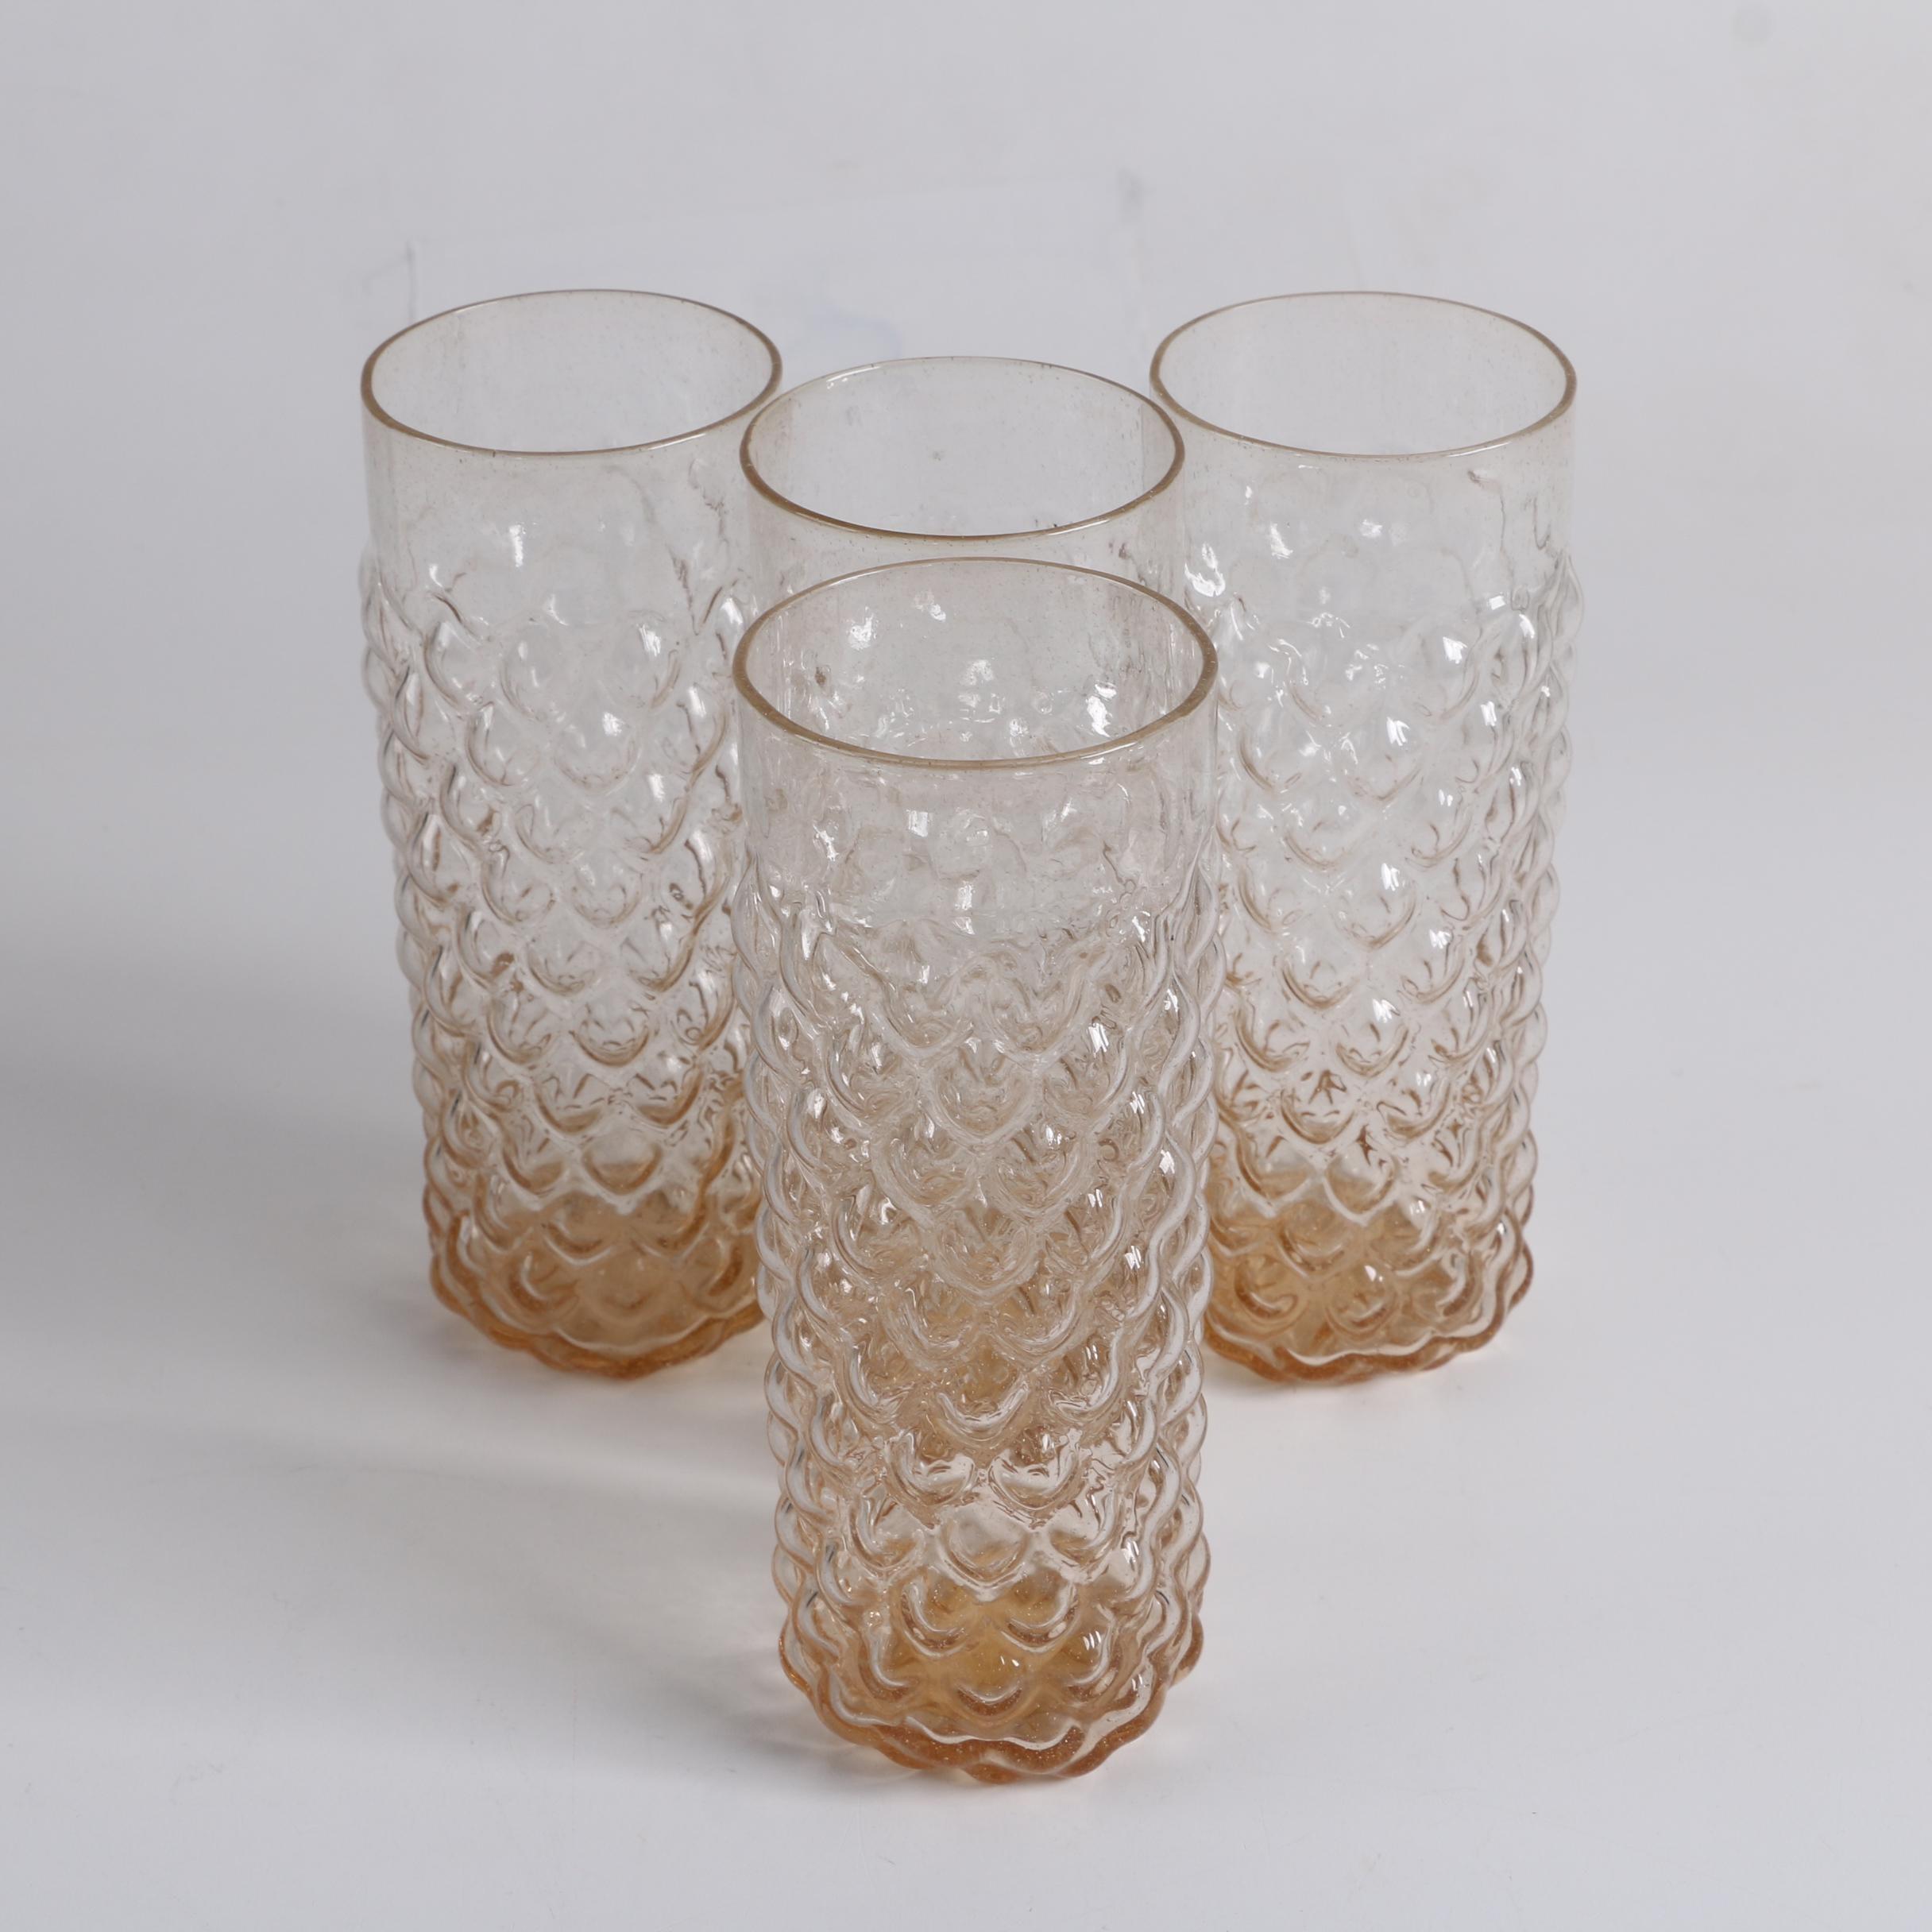 Vintage Pressed Glass Bubble Tumblers